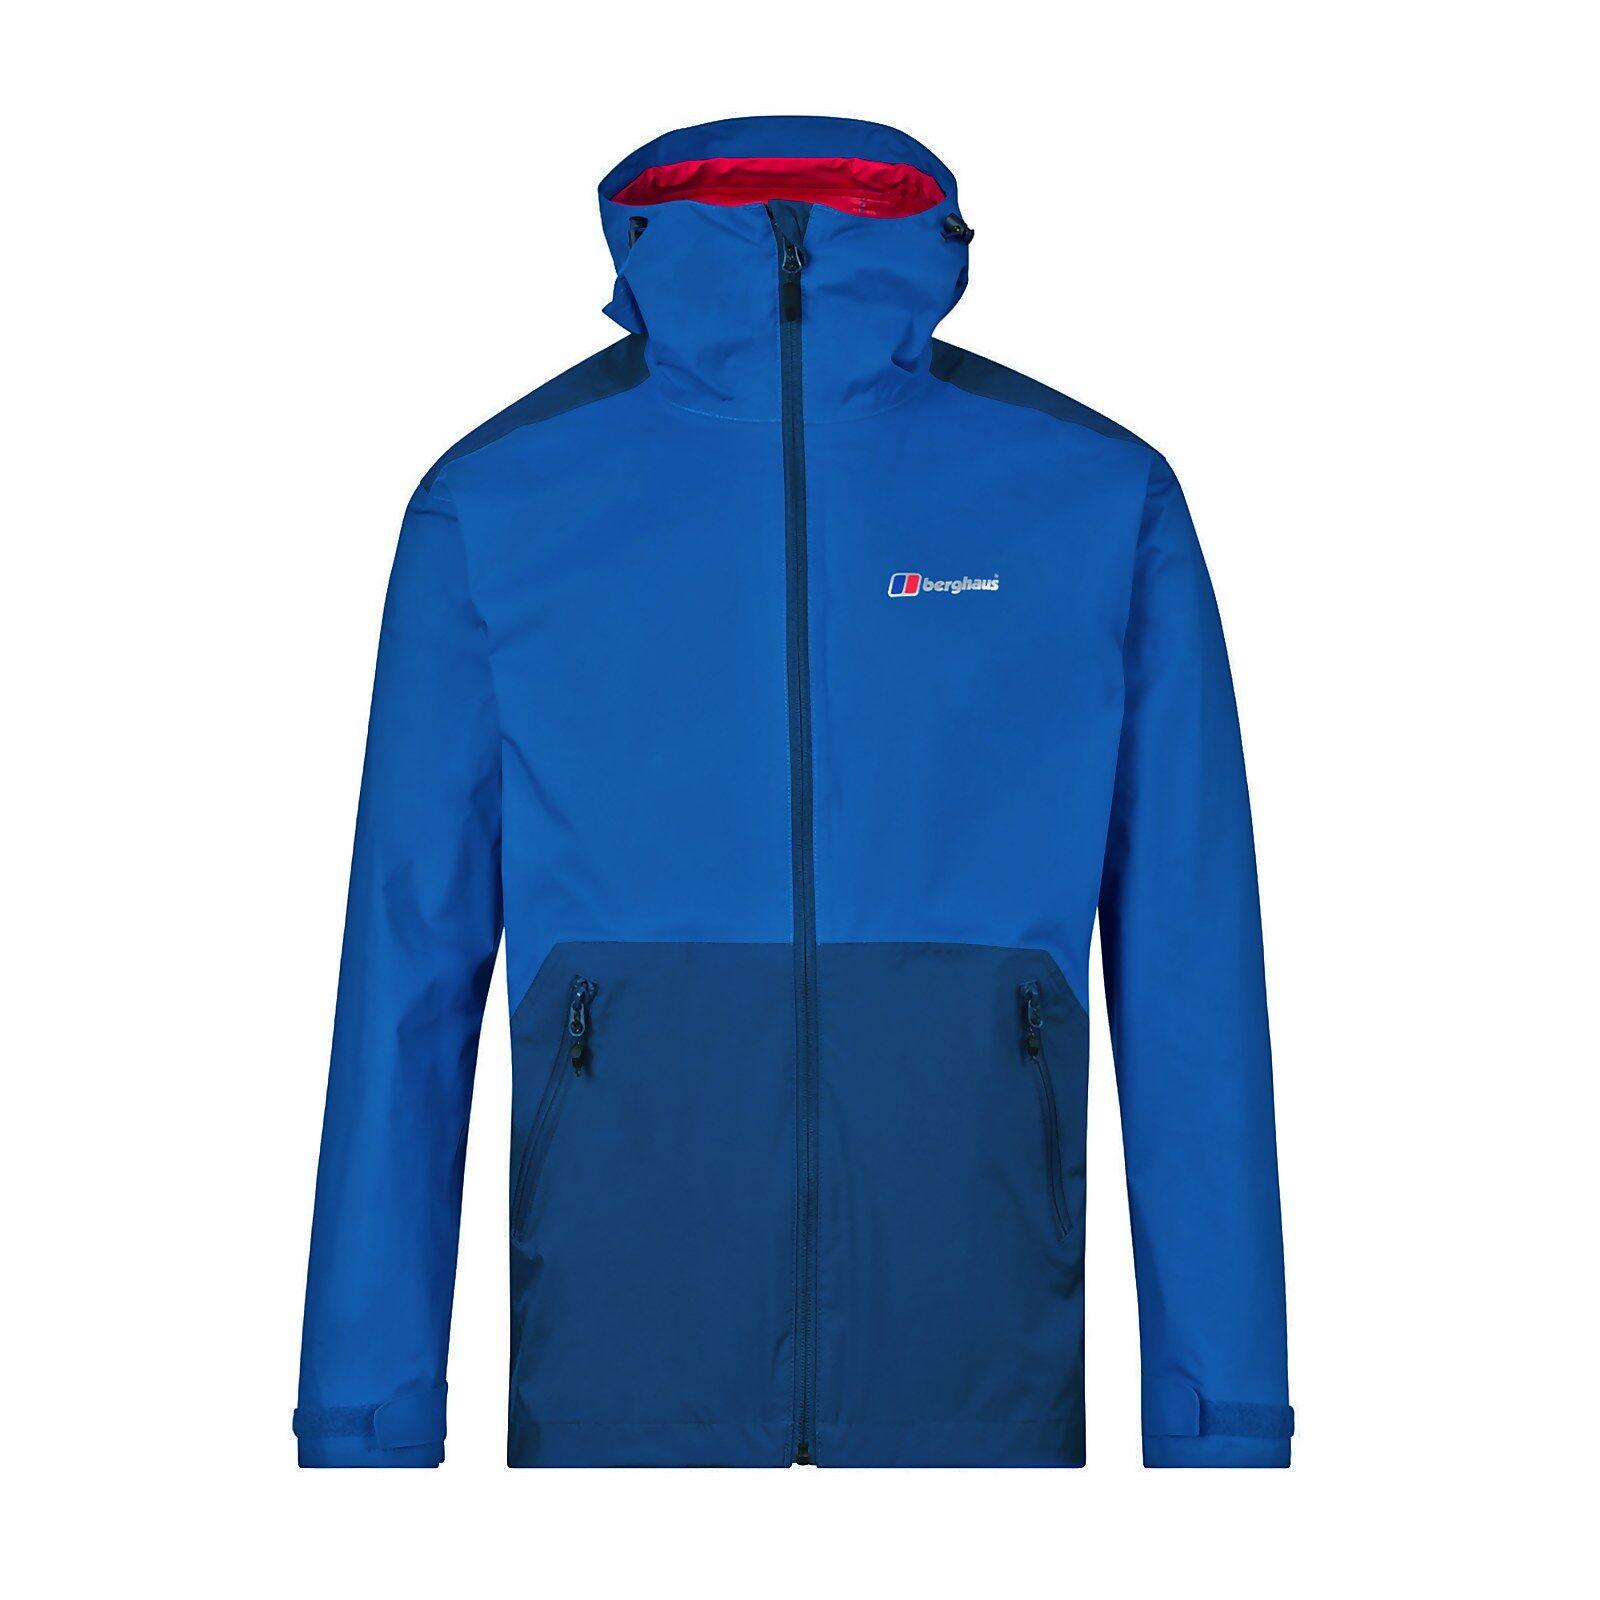 Berghaus Men's Deluge Pro Waterproof Jacket - Blue - XL  - Blue - Size: Extra Large